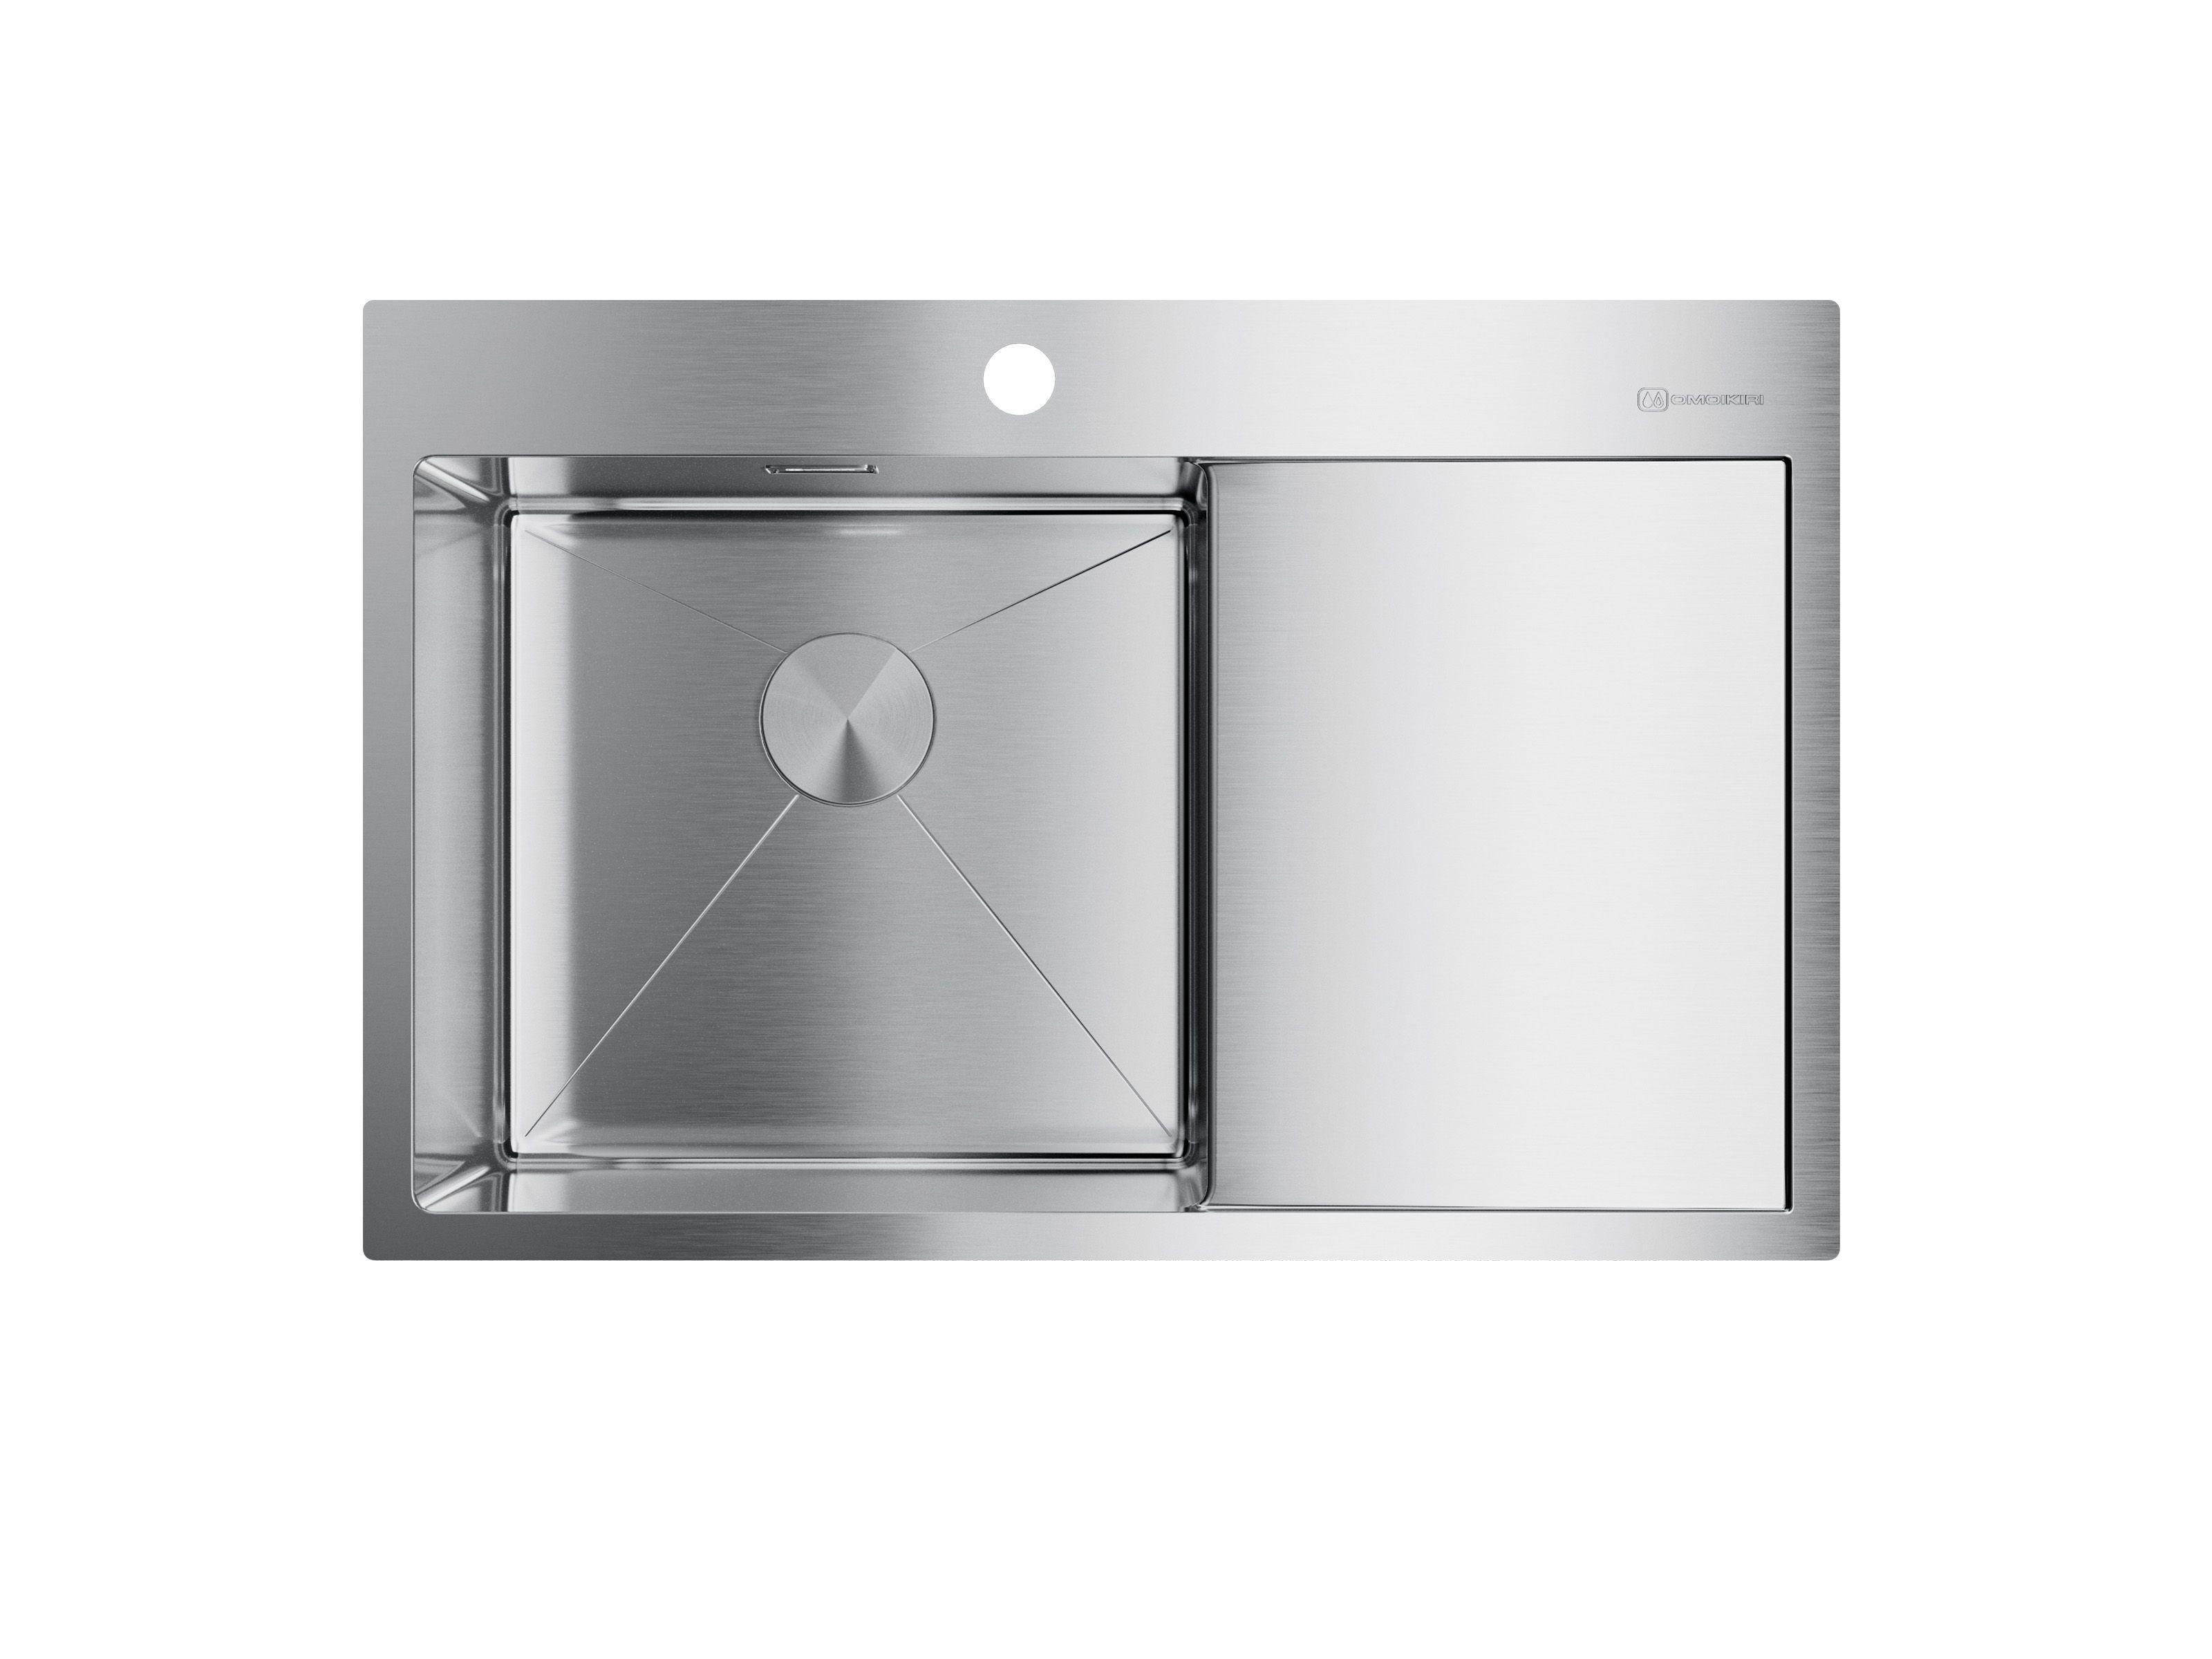 Мойка кухонная Omoikiri Akisame 78-in-l 4973060  смеситель для кухонной мойки bliss l am pm